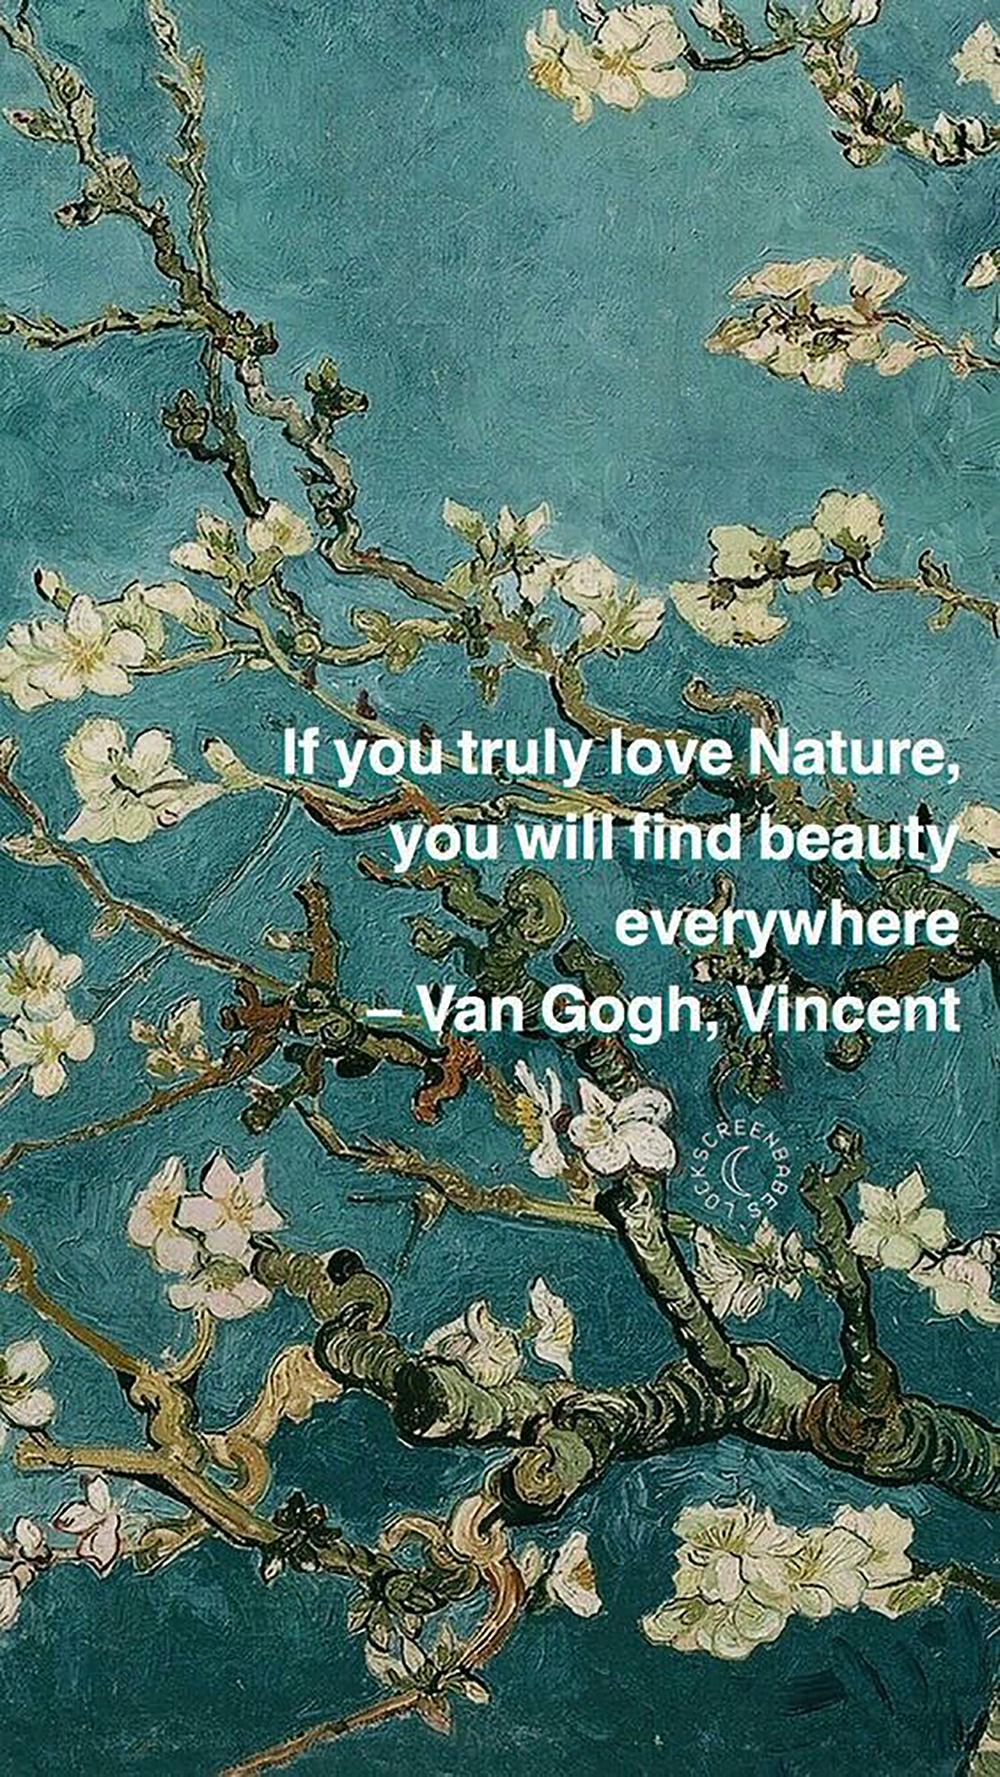 Bohemian Prints Vincent Van Gogh .jpg